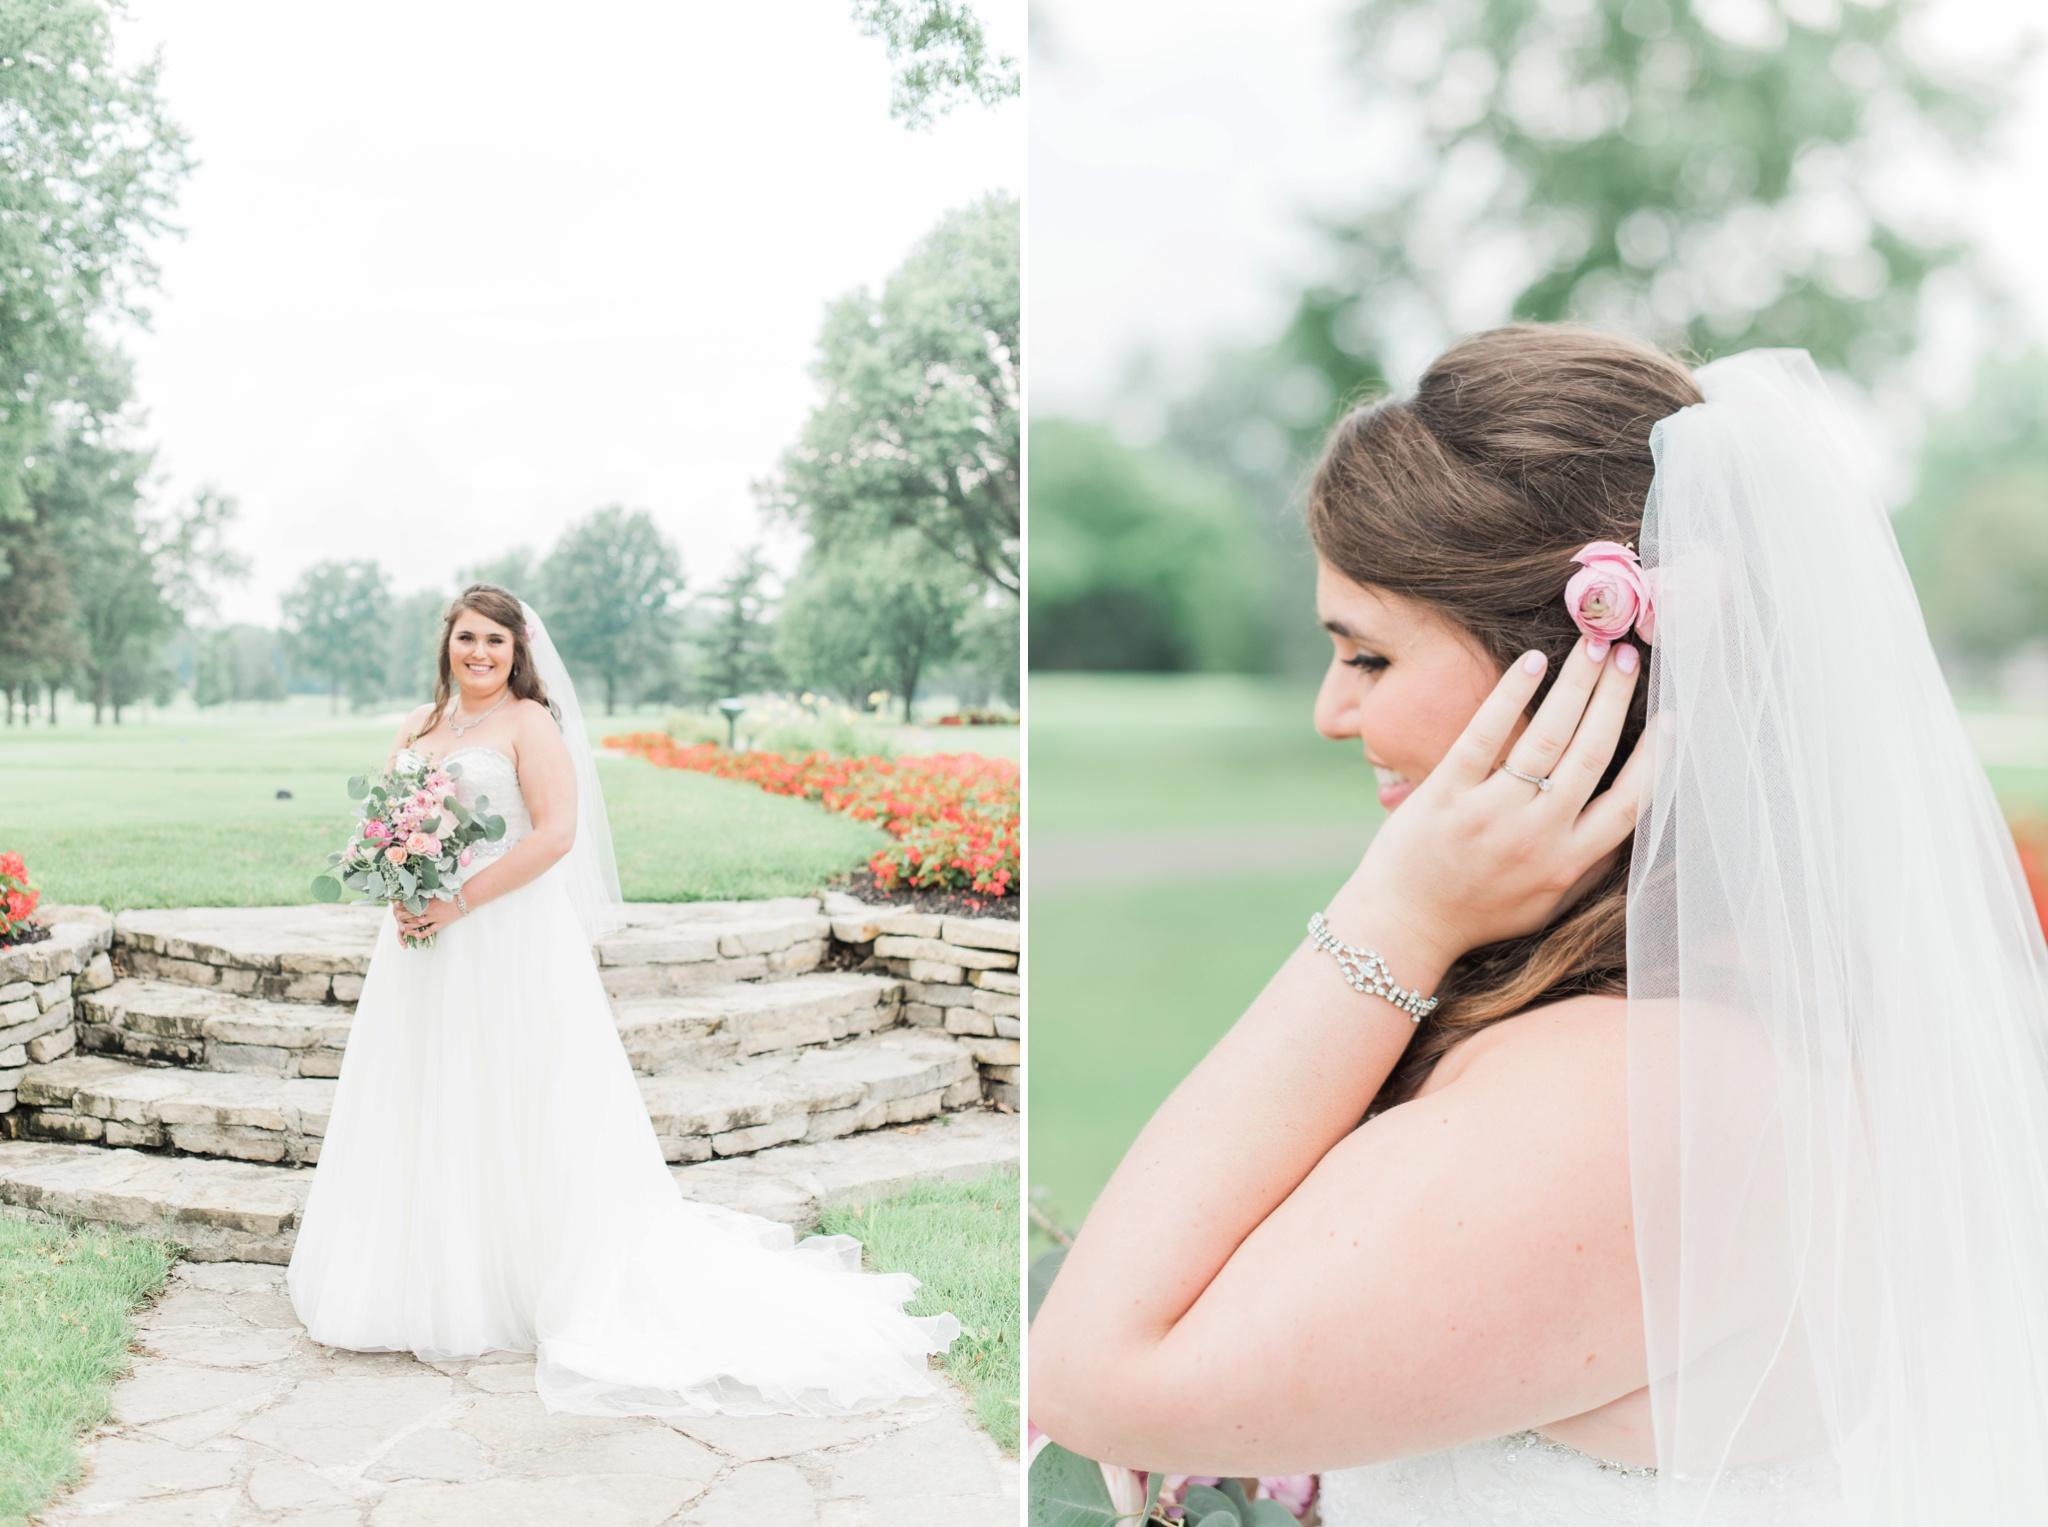 worthington-hills-country-club-wedding-columbus-ohio-meg-evan_0132.jpg